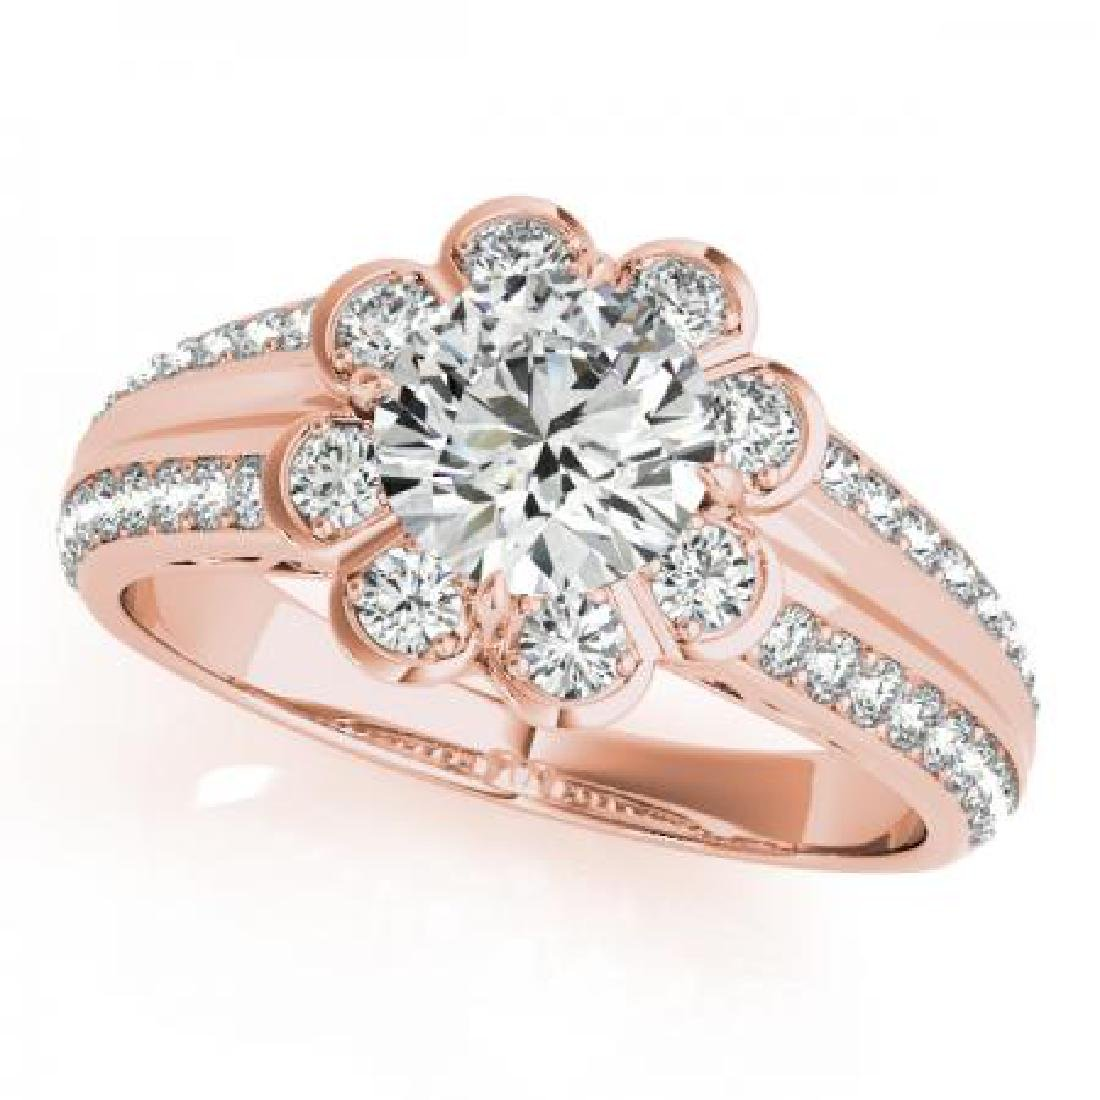 CERTIFIED 18K ROSE GOLD 1.18 CT G-H/VS-SI1 DIAMOND HALO